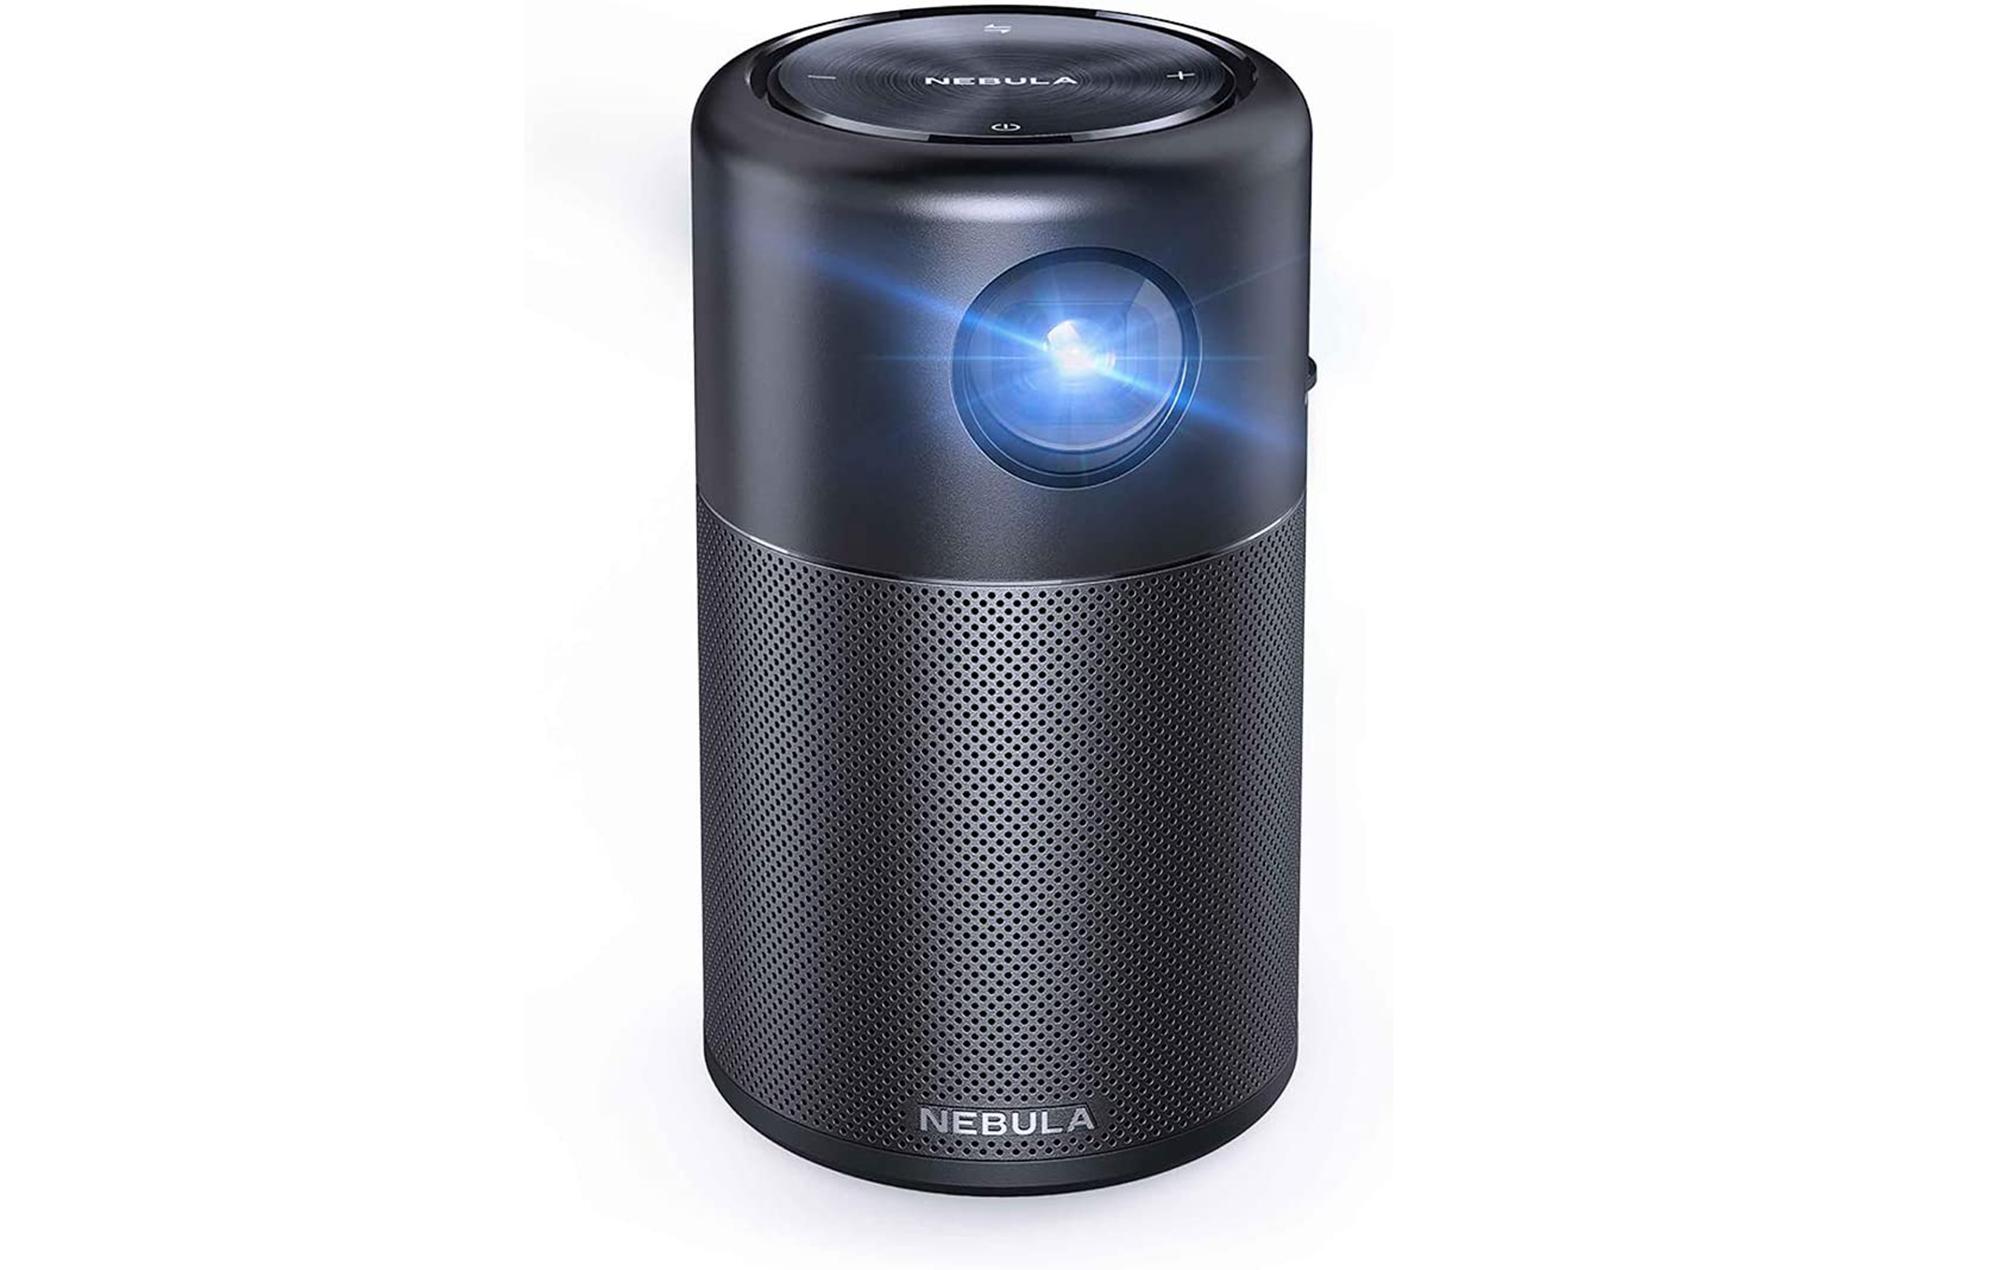 anker nebula mini projector